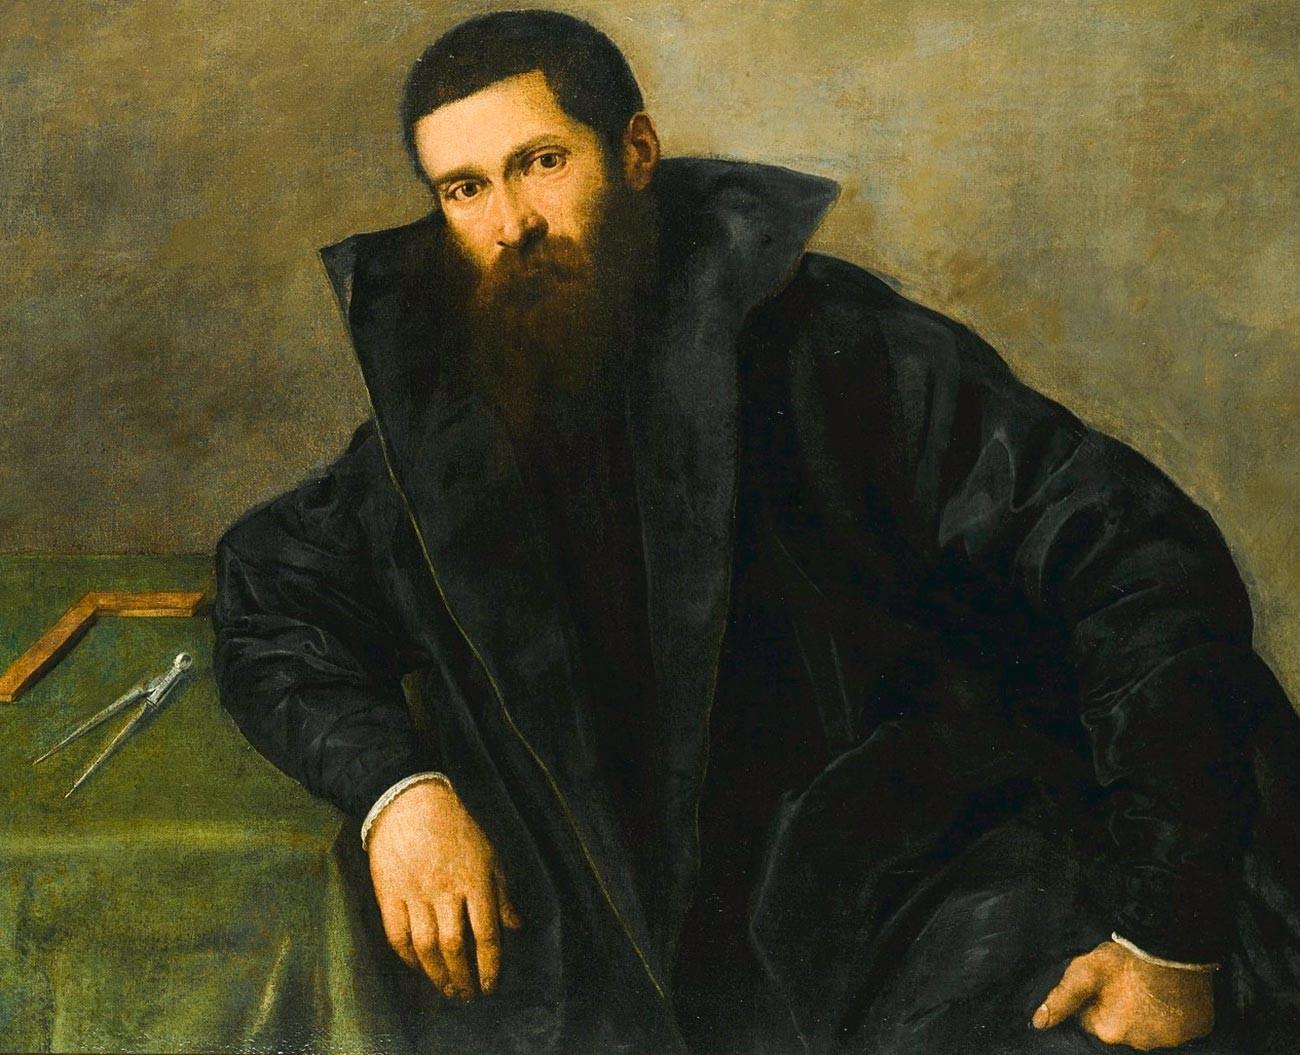 Aristotele Fioravanti